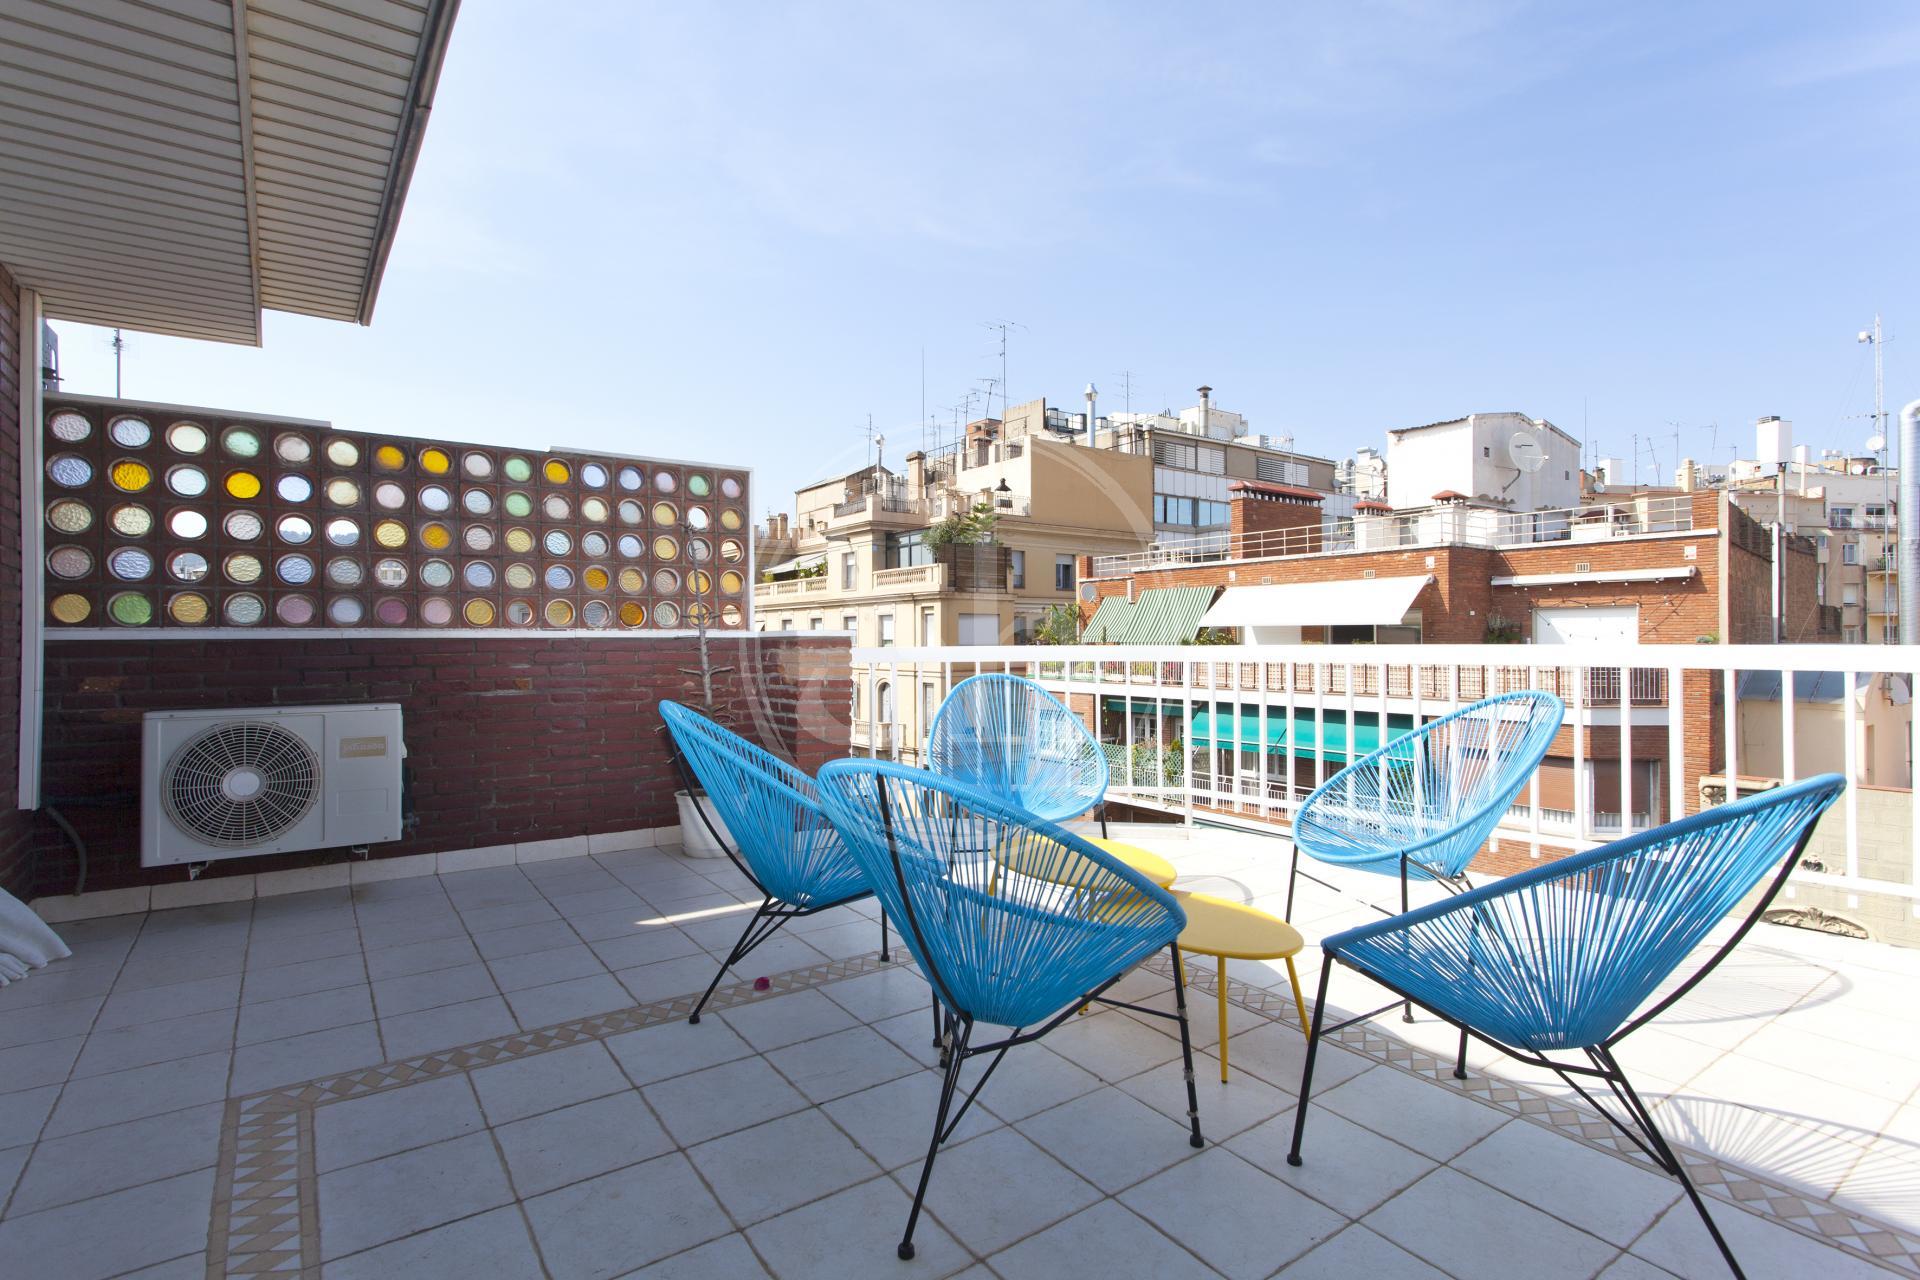 Pis en lloguer barcelona l 39 eixample casanova londres - Lloguer pis barcelona particular ...